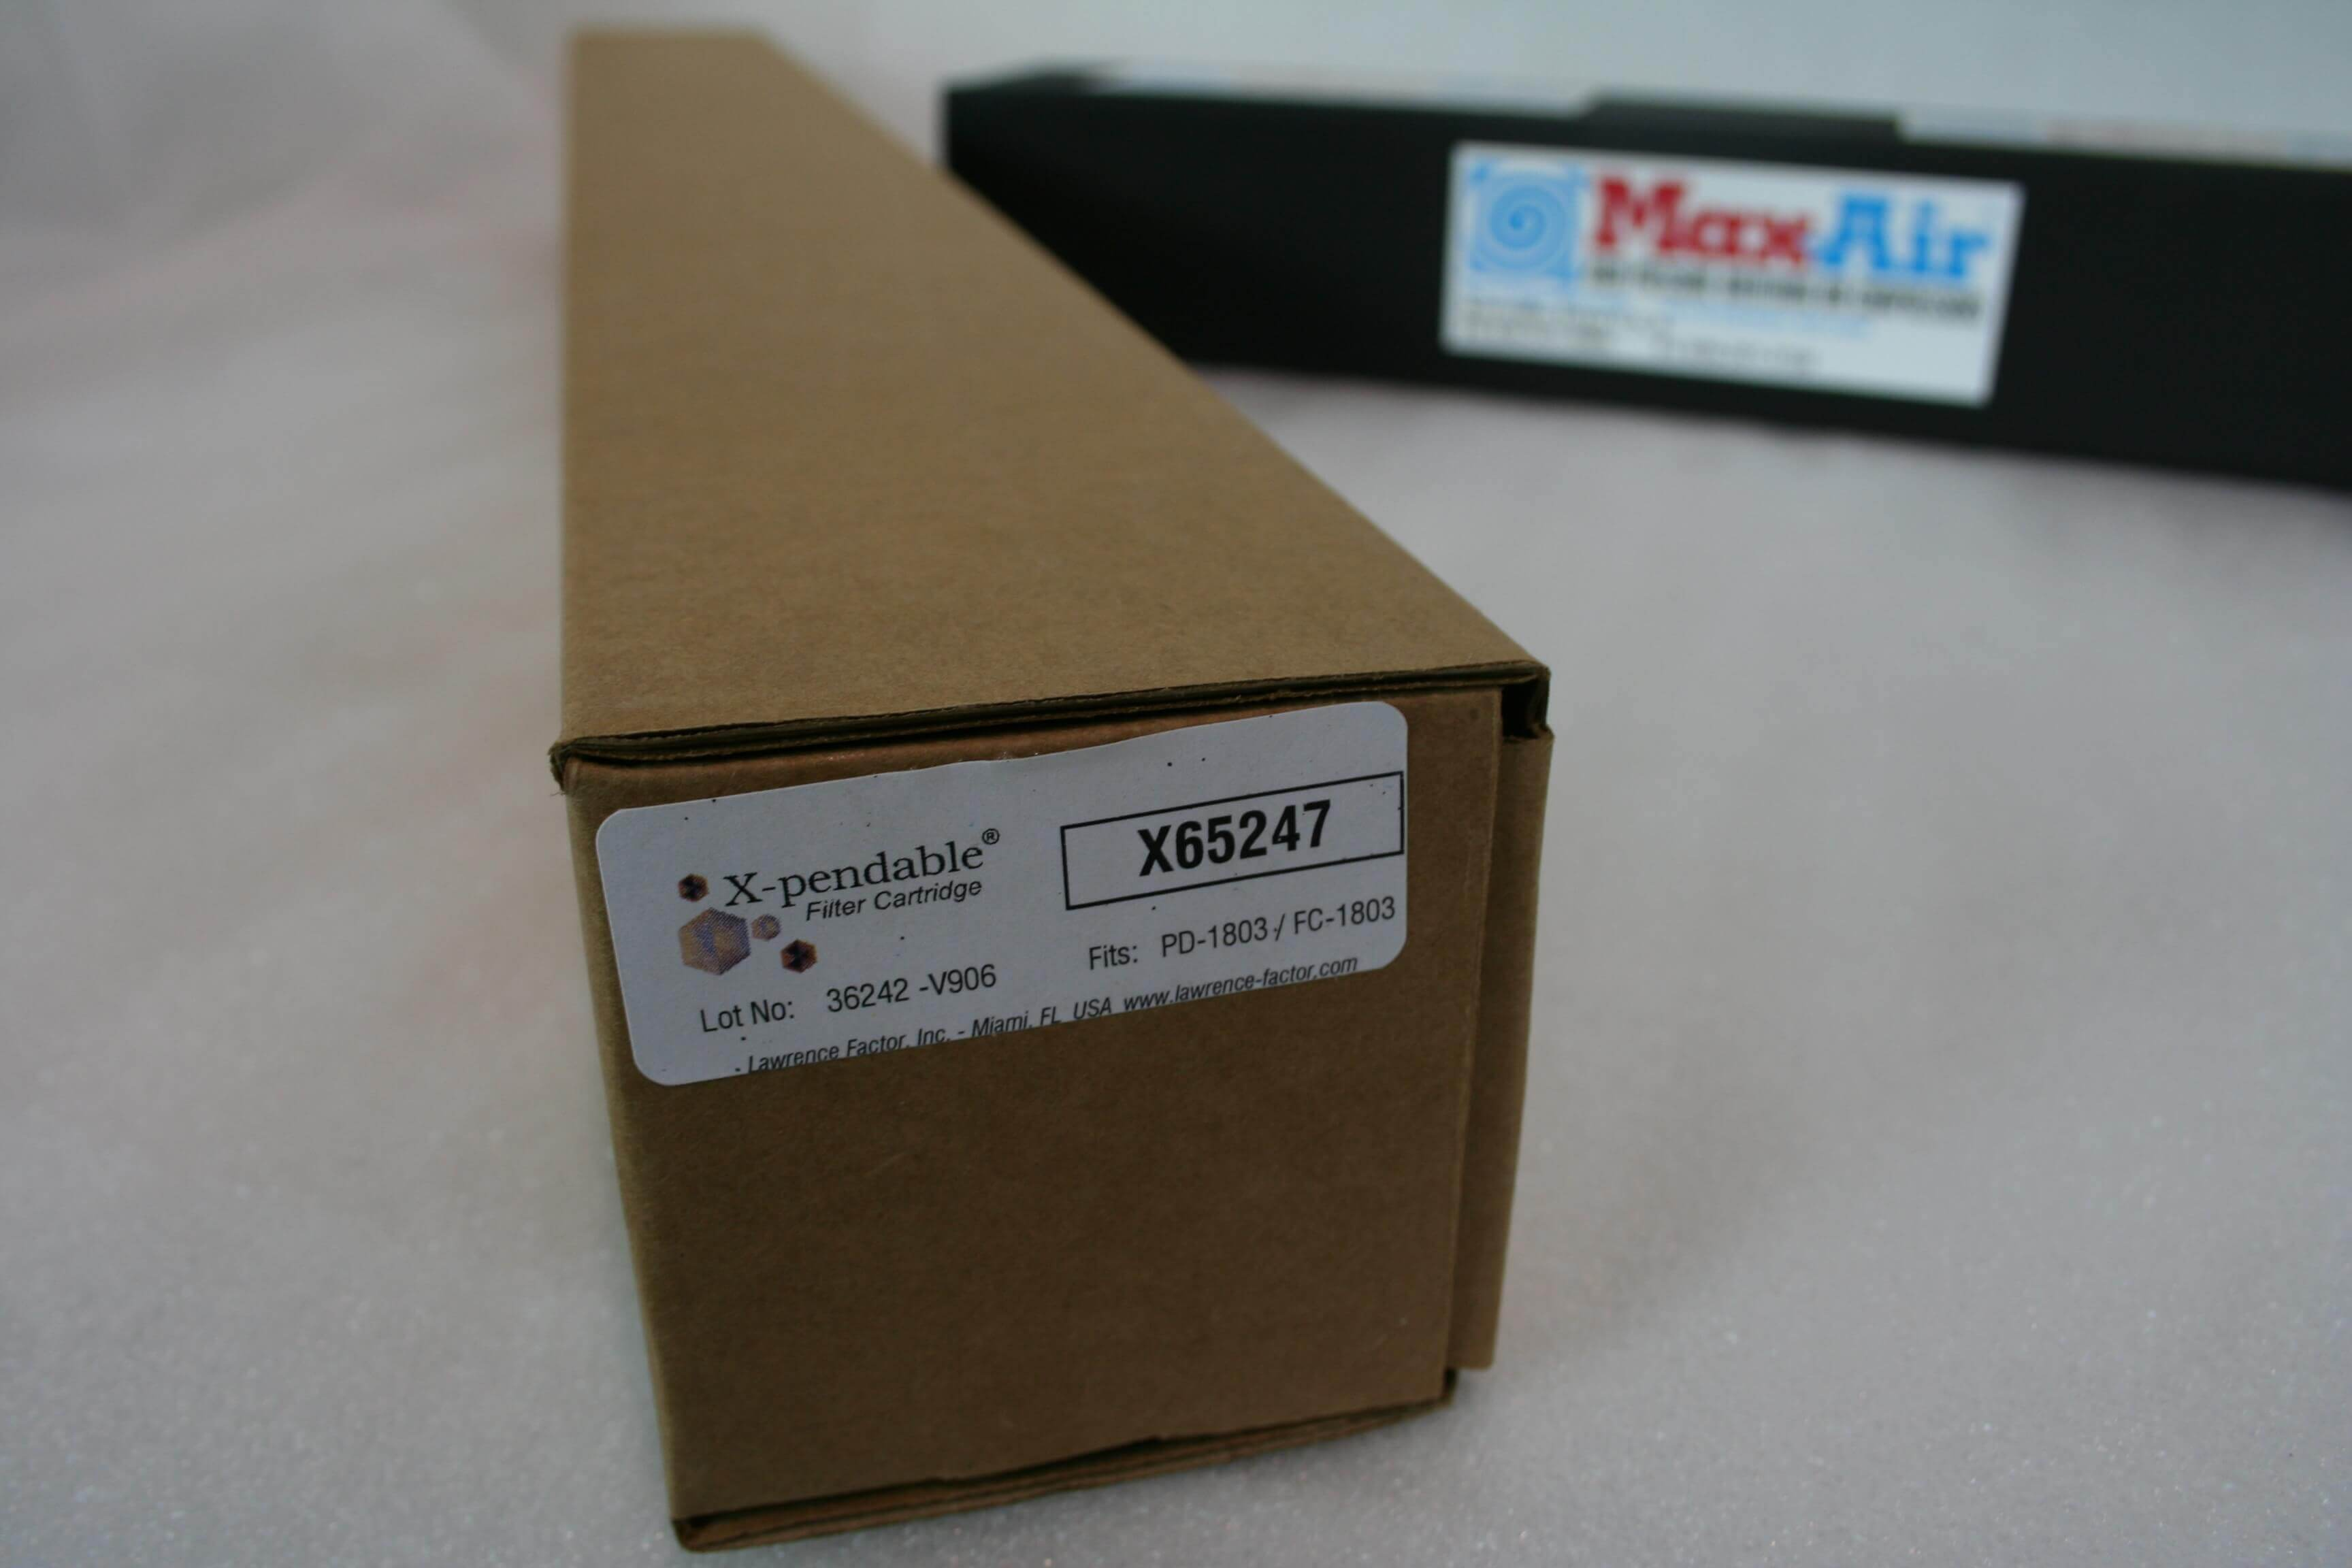 Max-Air 55/90 35,000 CFT Purification Cartridge LF-65247